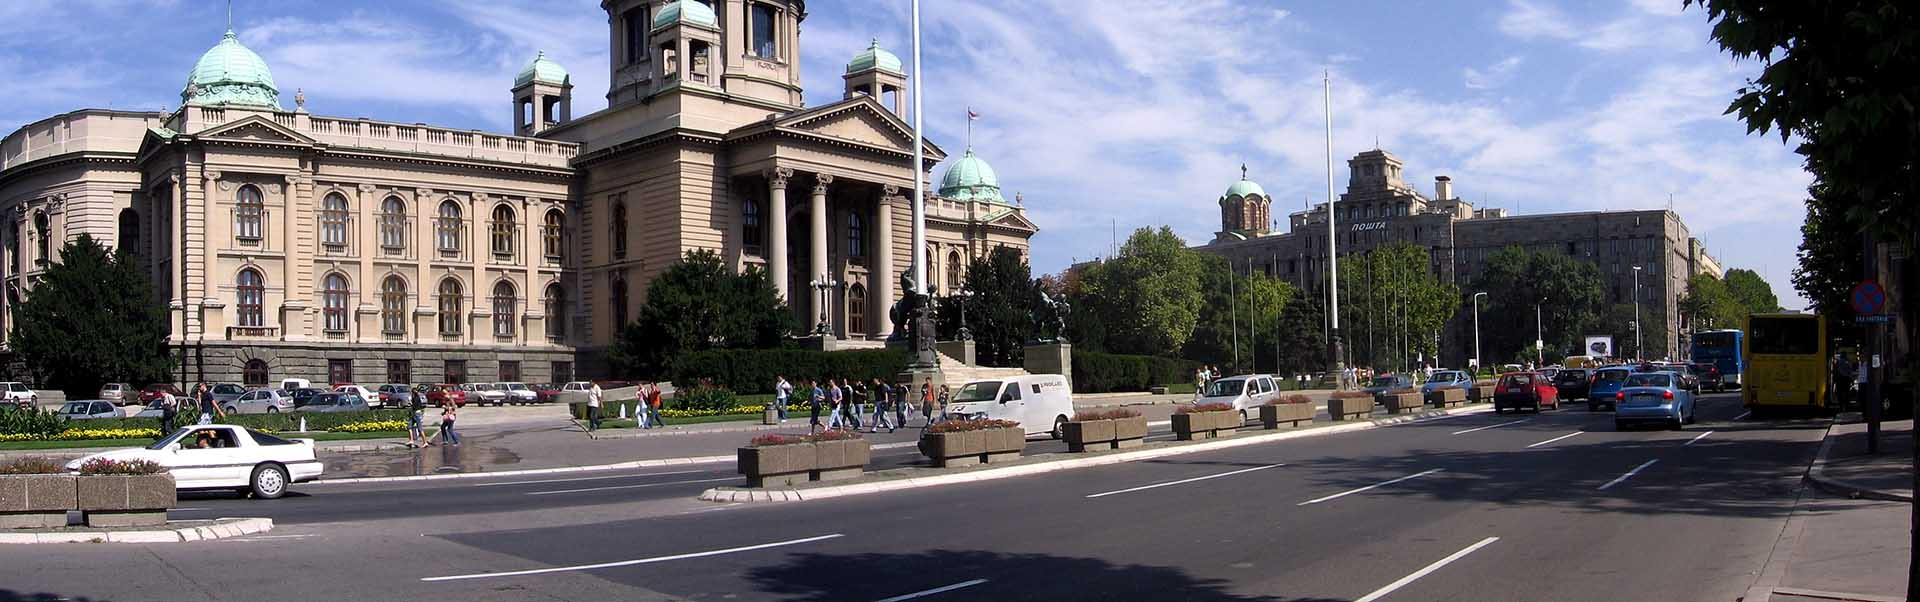 Dostava hrane Bulevar | Beograd